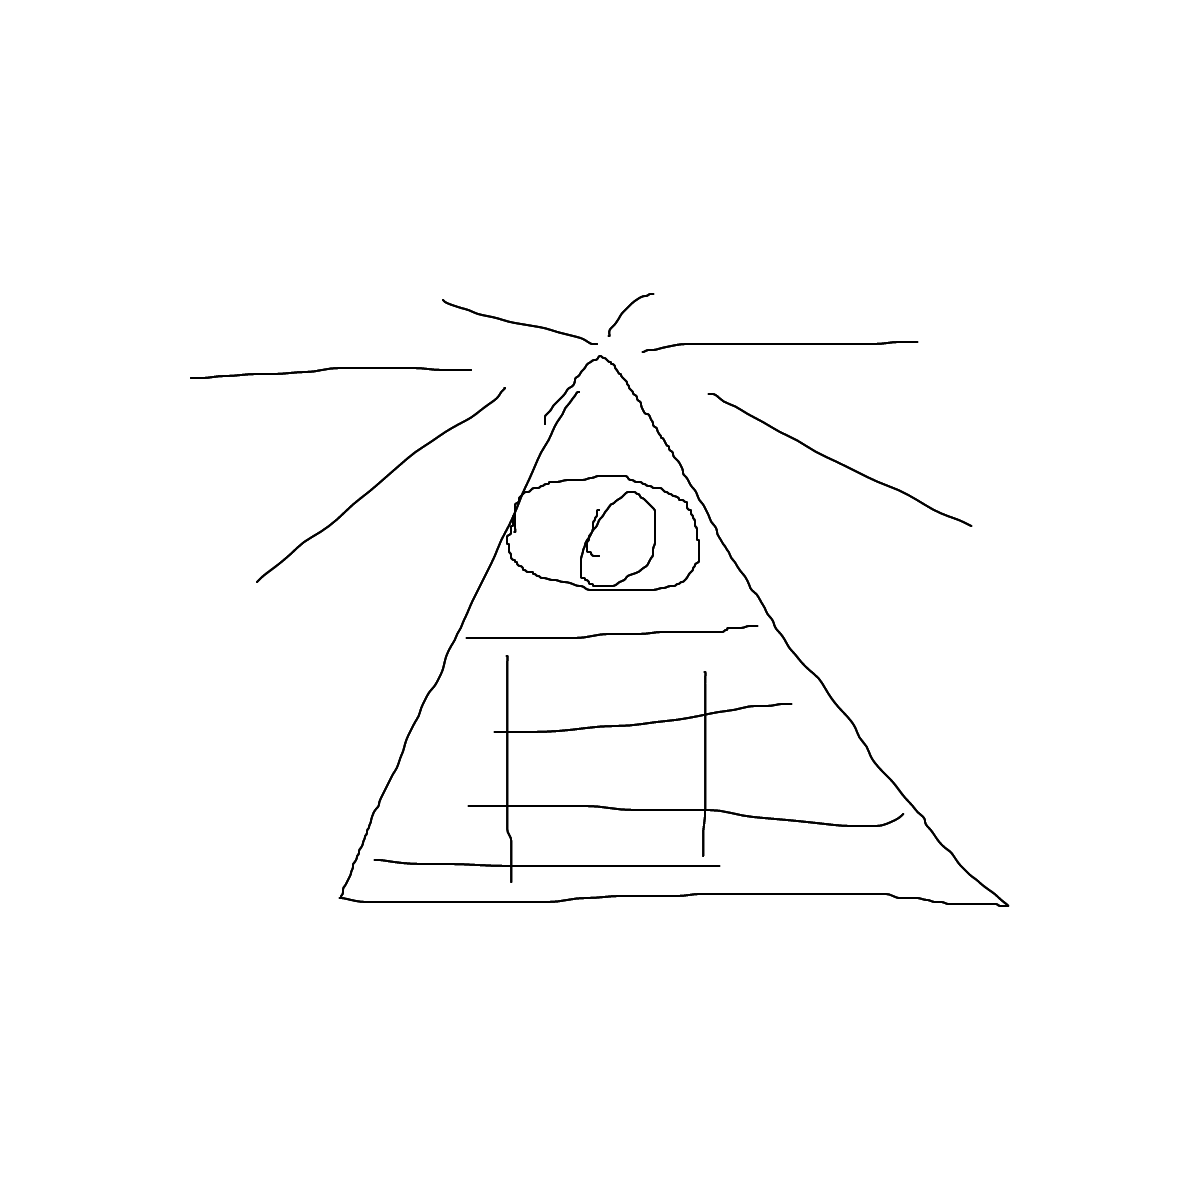 BAAAM drawing#6573 lat:45.4361534118652340lng: -75.6949691772461000